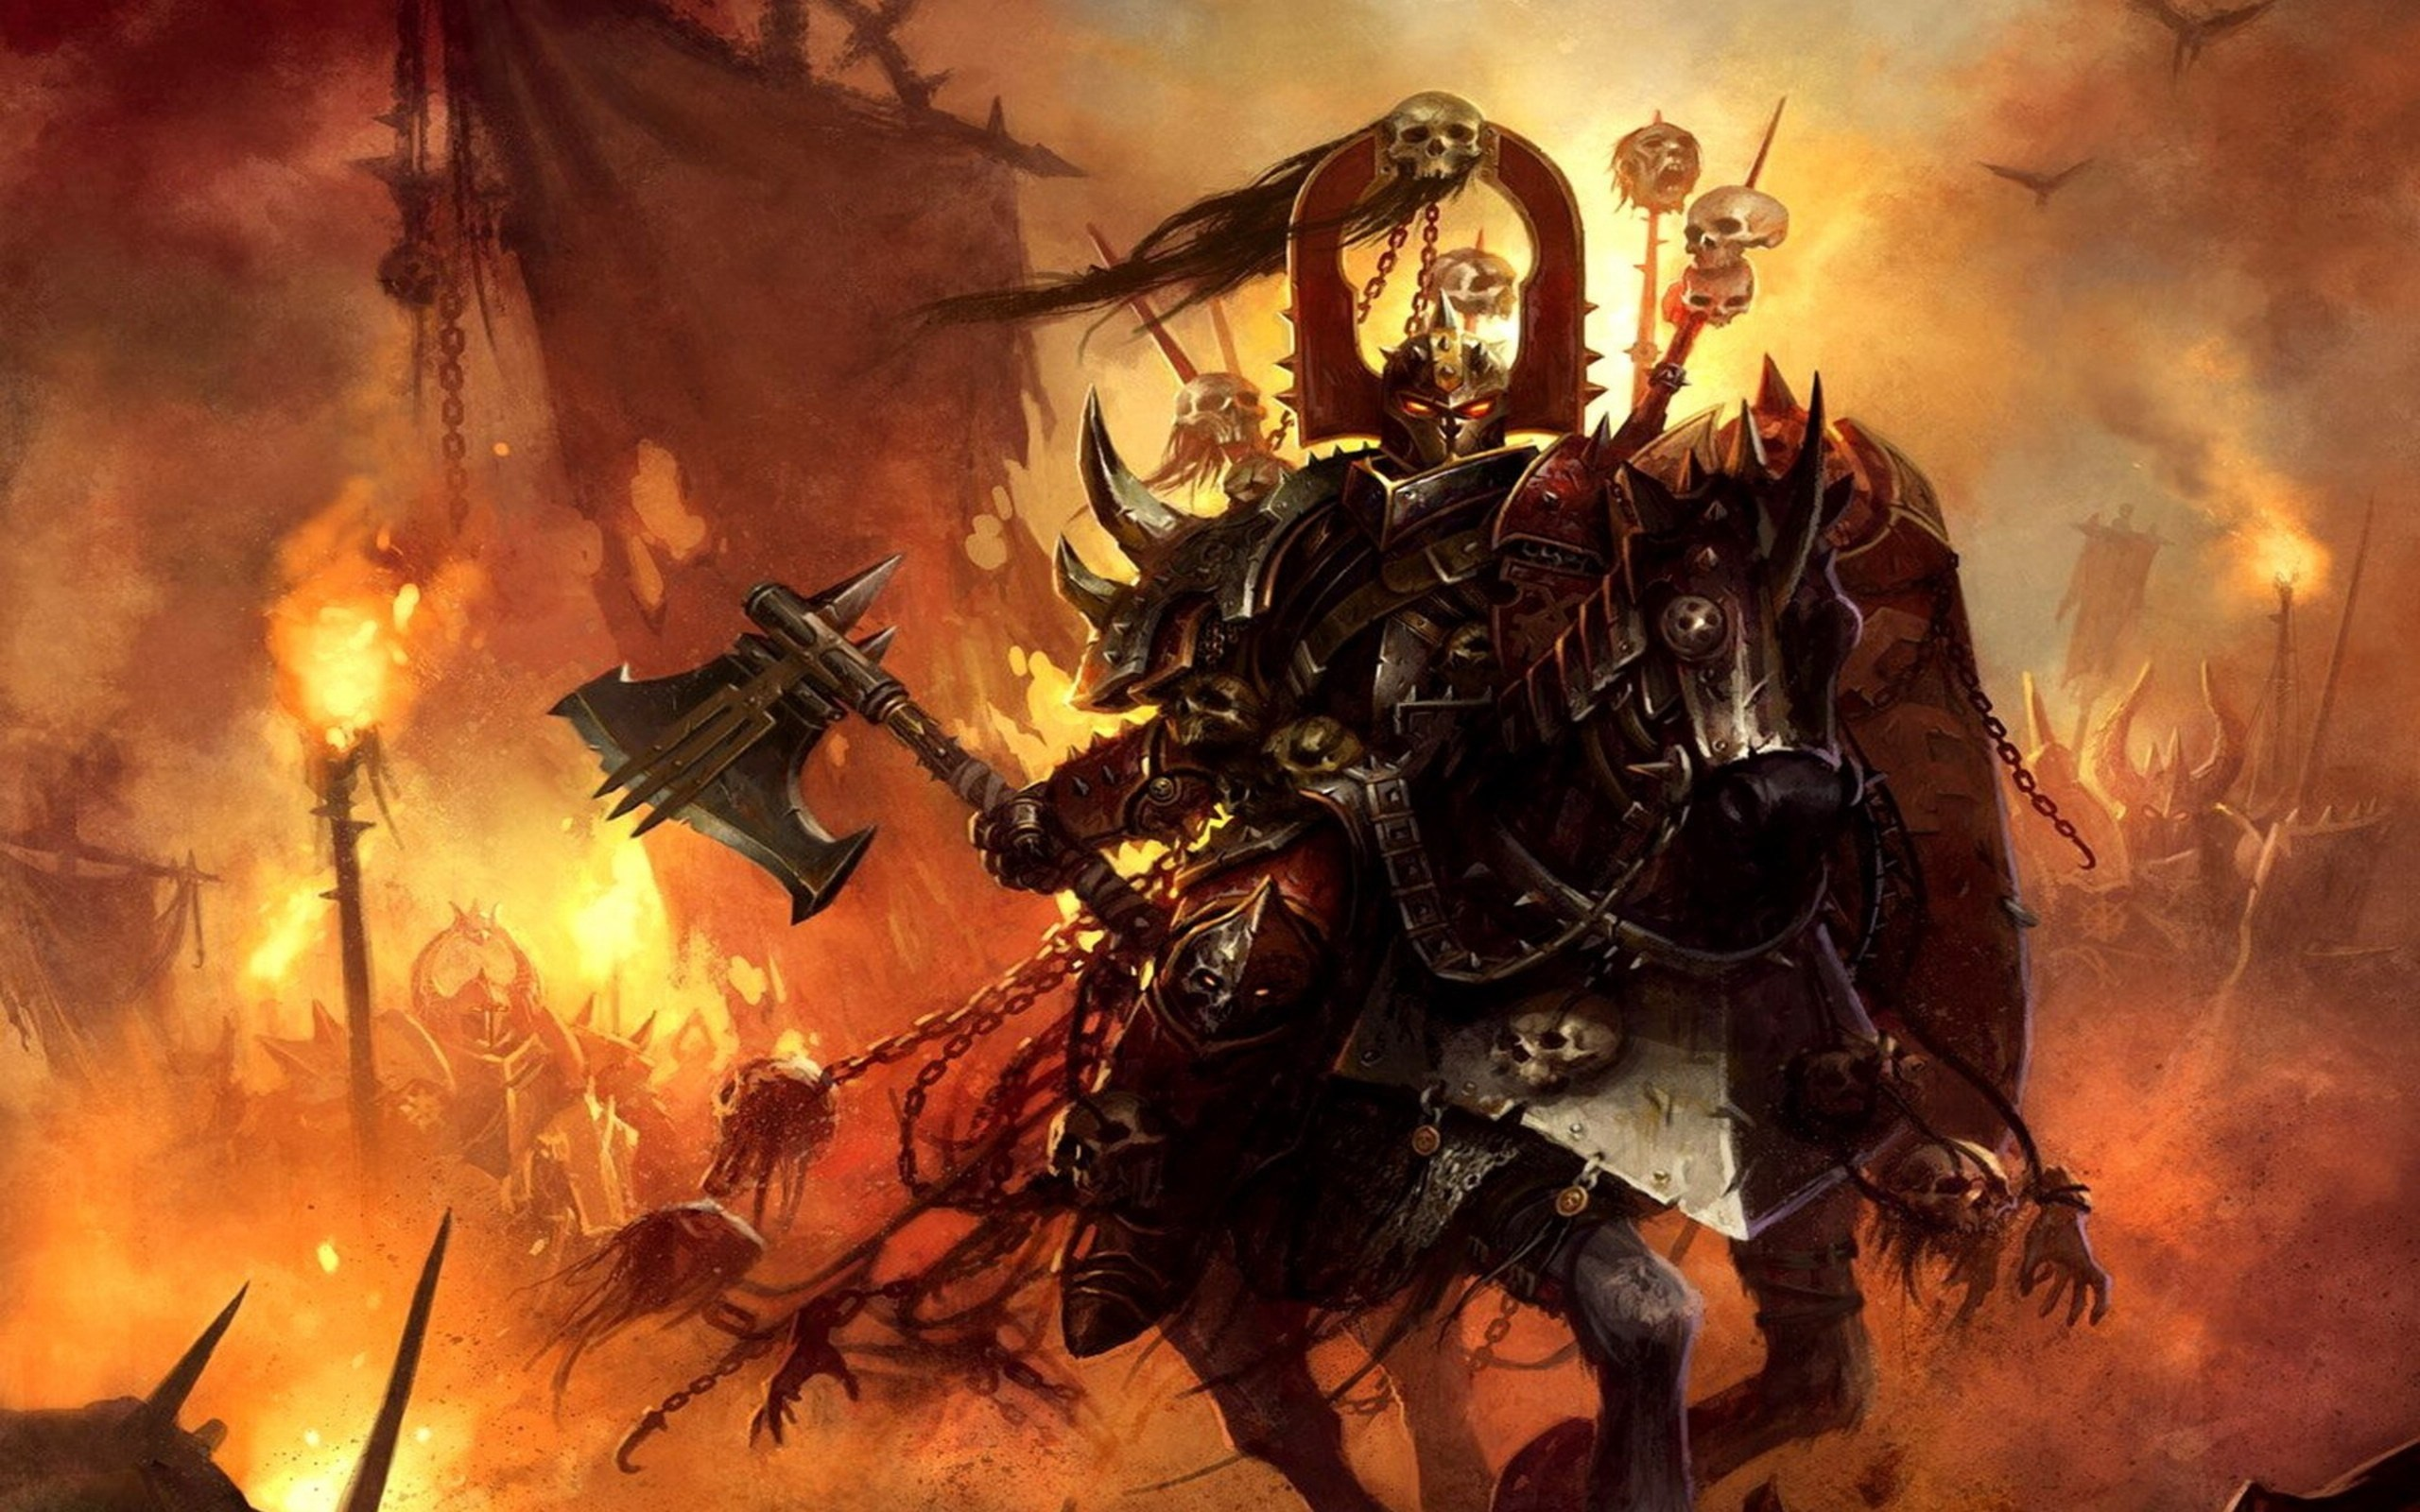 Warhammer 40k Chaos Wallpaper 75 Images